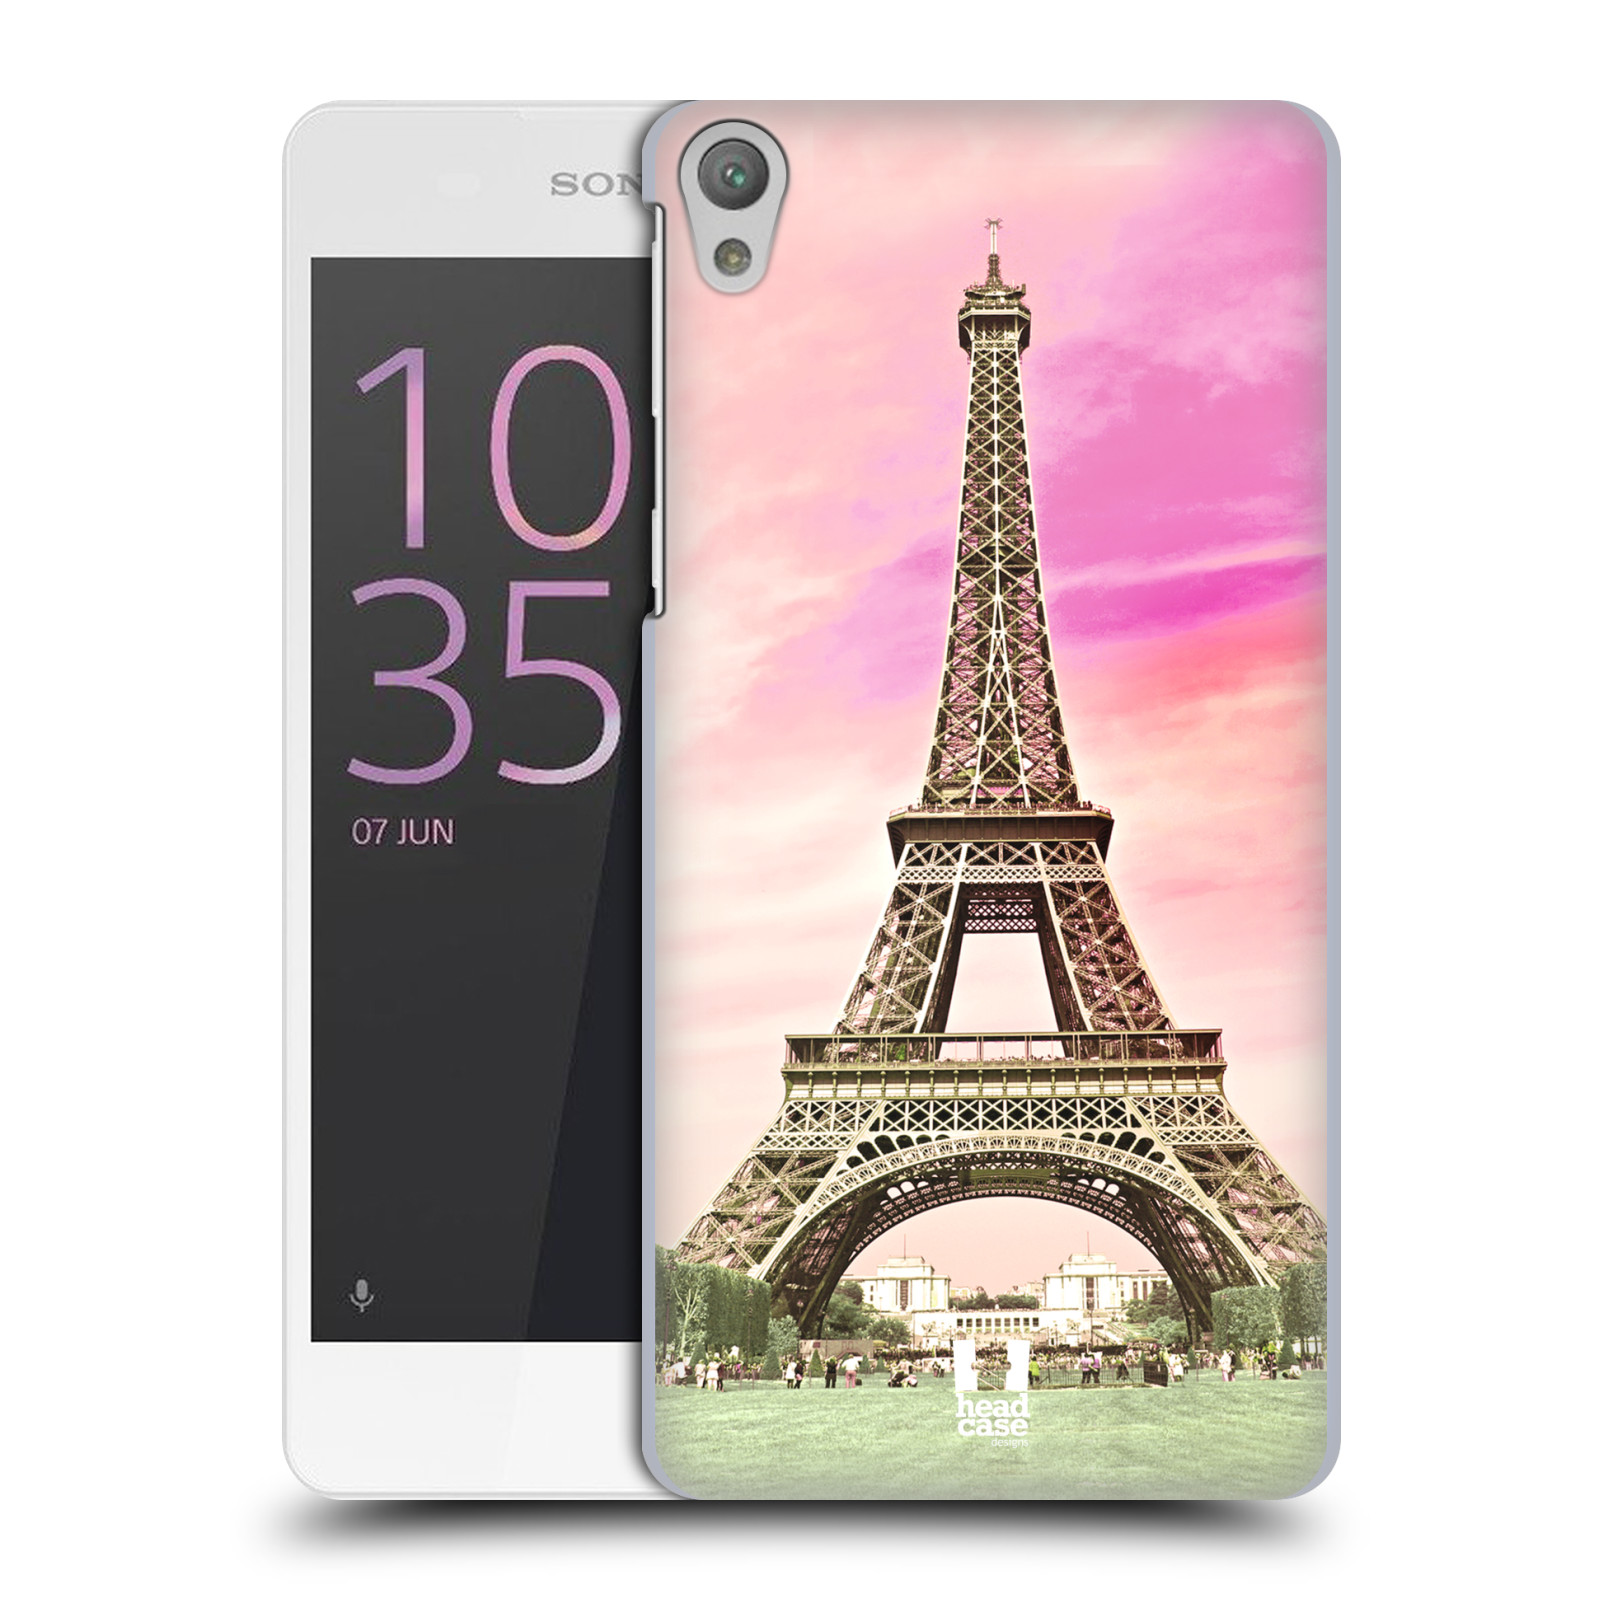 Pouzdro na mobil Sony Xperia E5 - HEAD CASE - historická místa Eiffelova věž Paříž